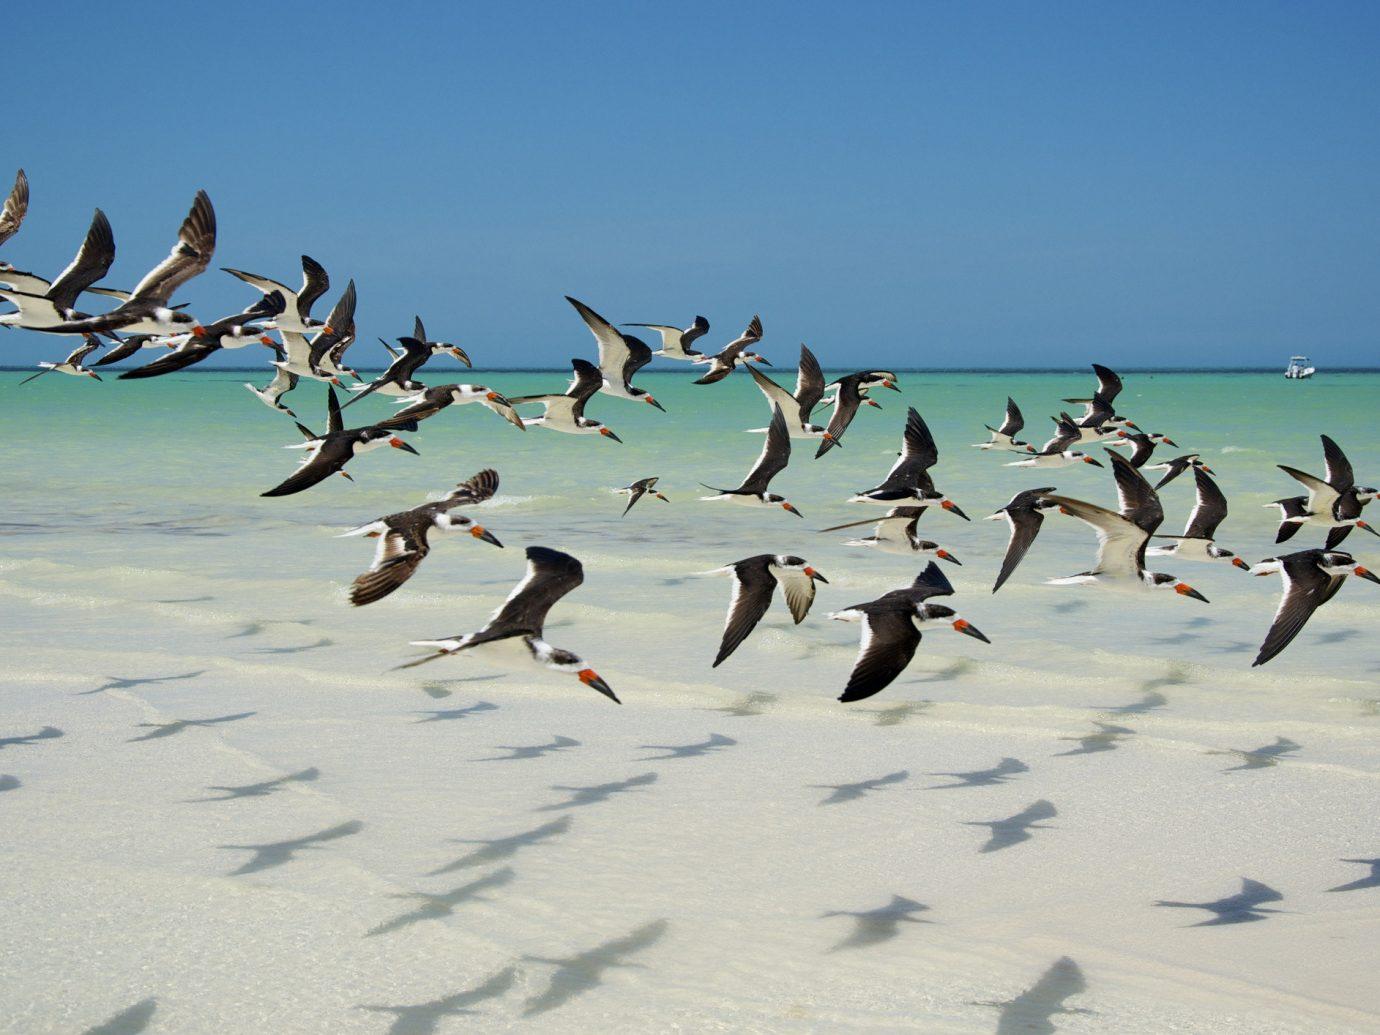 Mexico Trip Ideas Weekend Getaways outdoor Bird flock Beach Sea group aquatic bird wind several day sandy